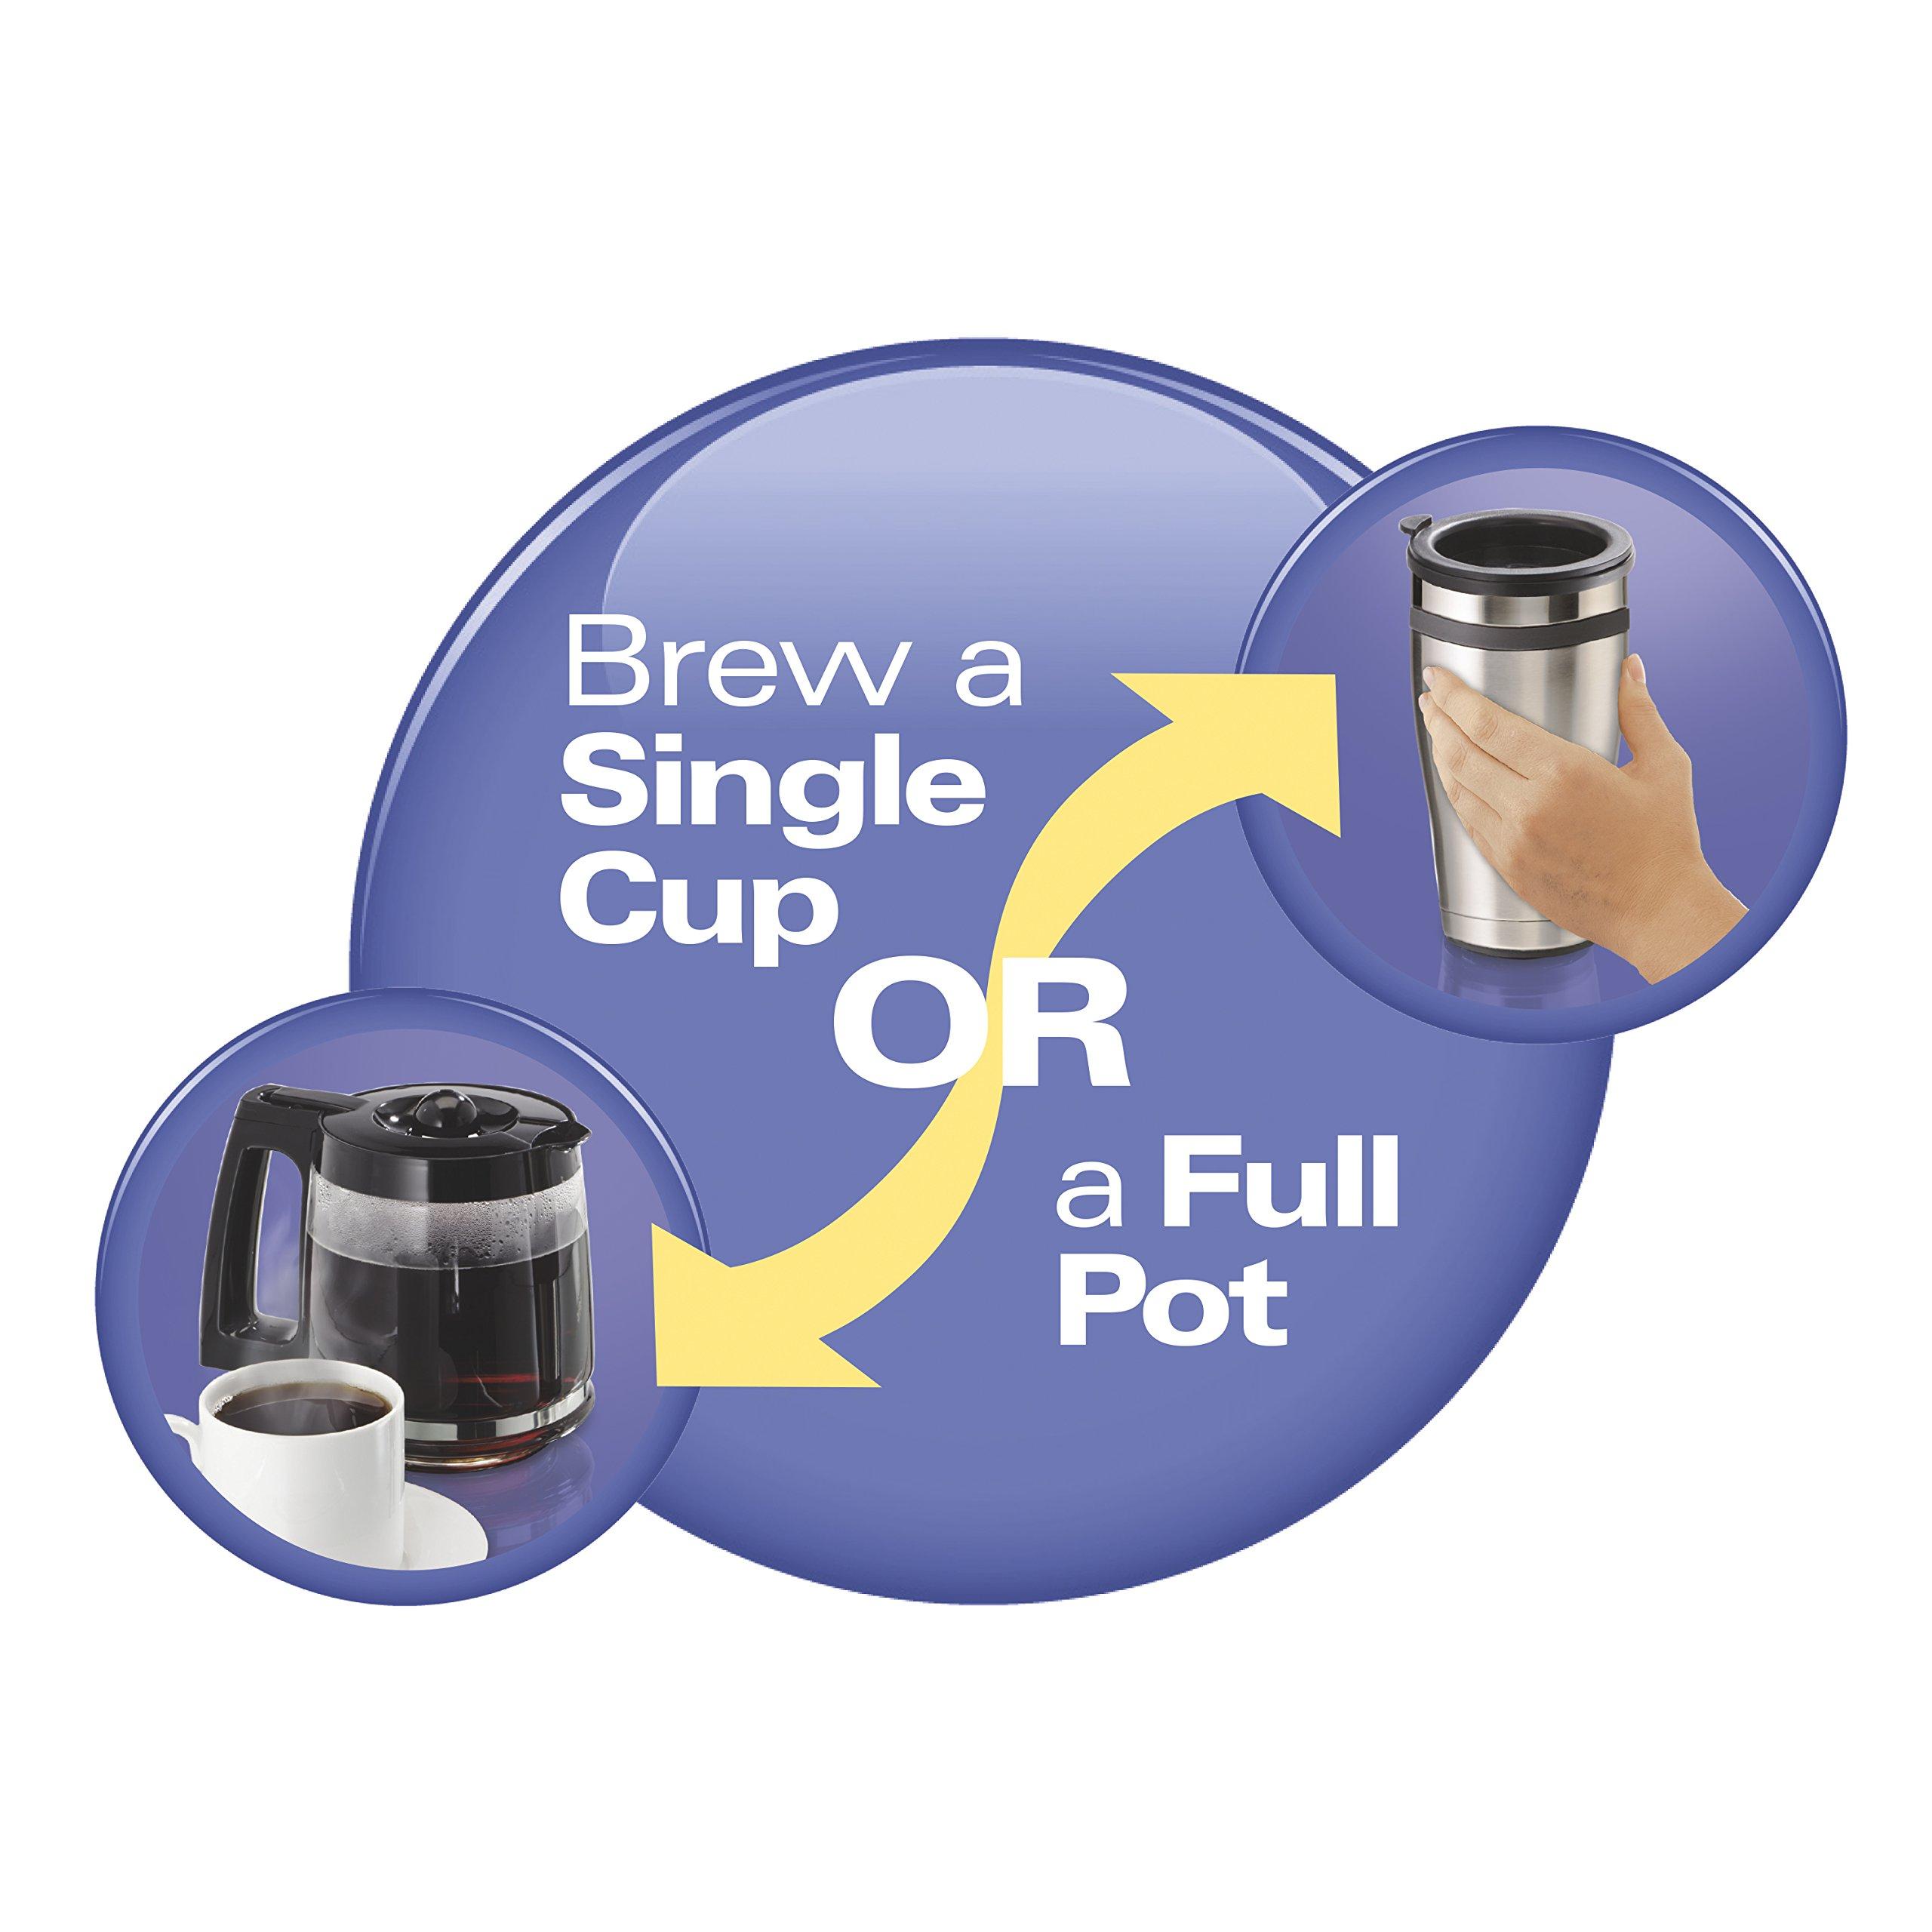 Hamilton Beach 49950C Flexbrew 2-Way Brewer Programmable Coffee Maker, Black by Hamilton Beach (Image #2)